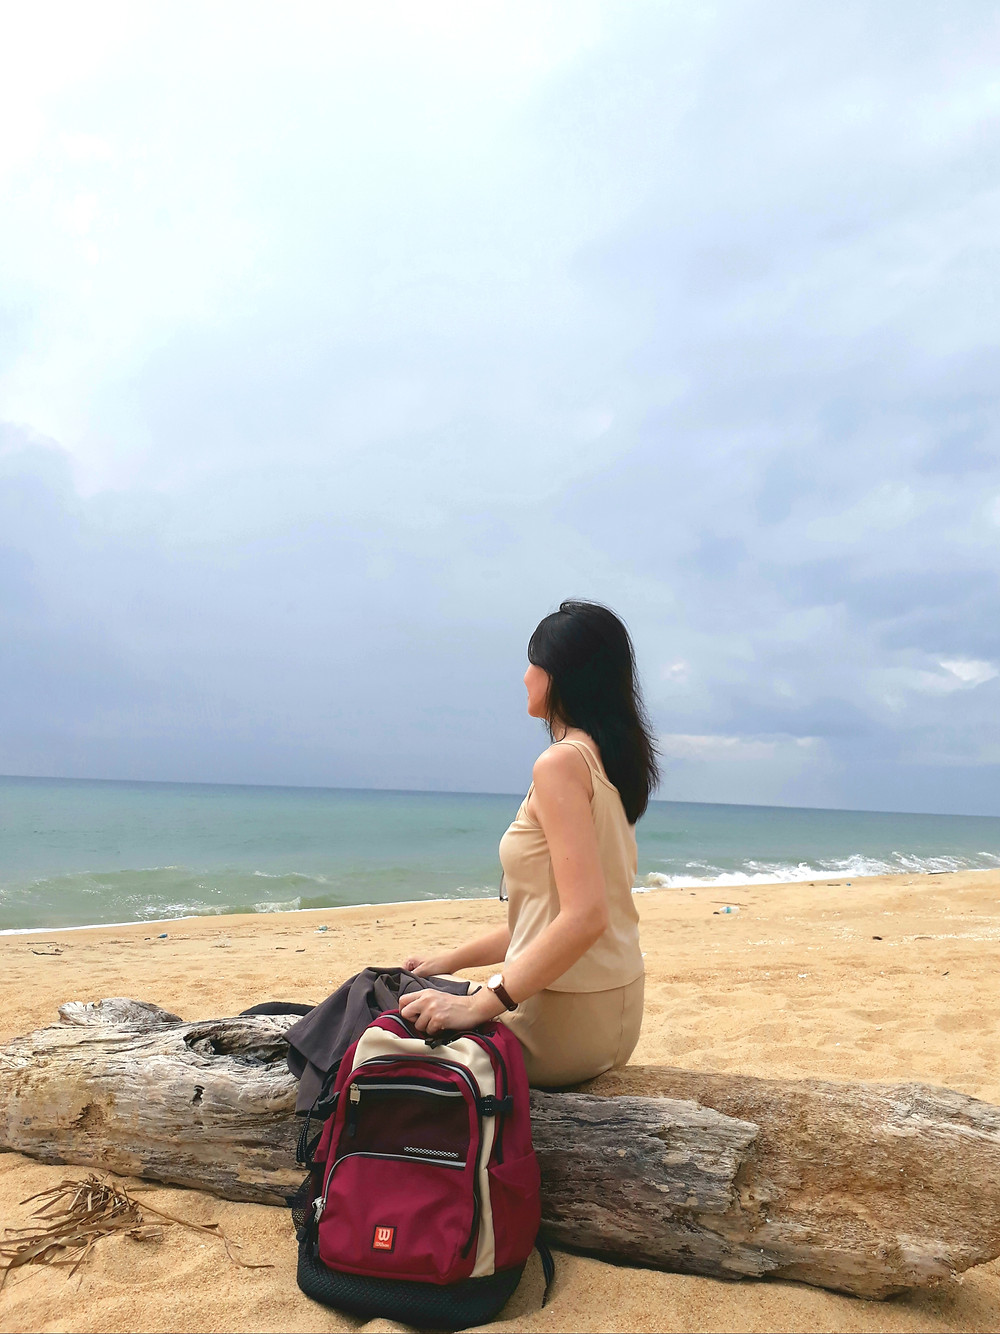 Enjoying the sea breeze in Dungun, Terengganu, Malaysia